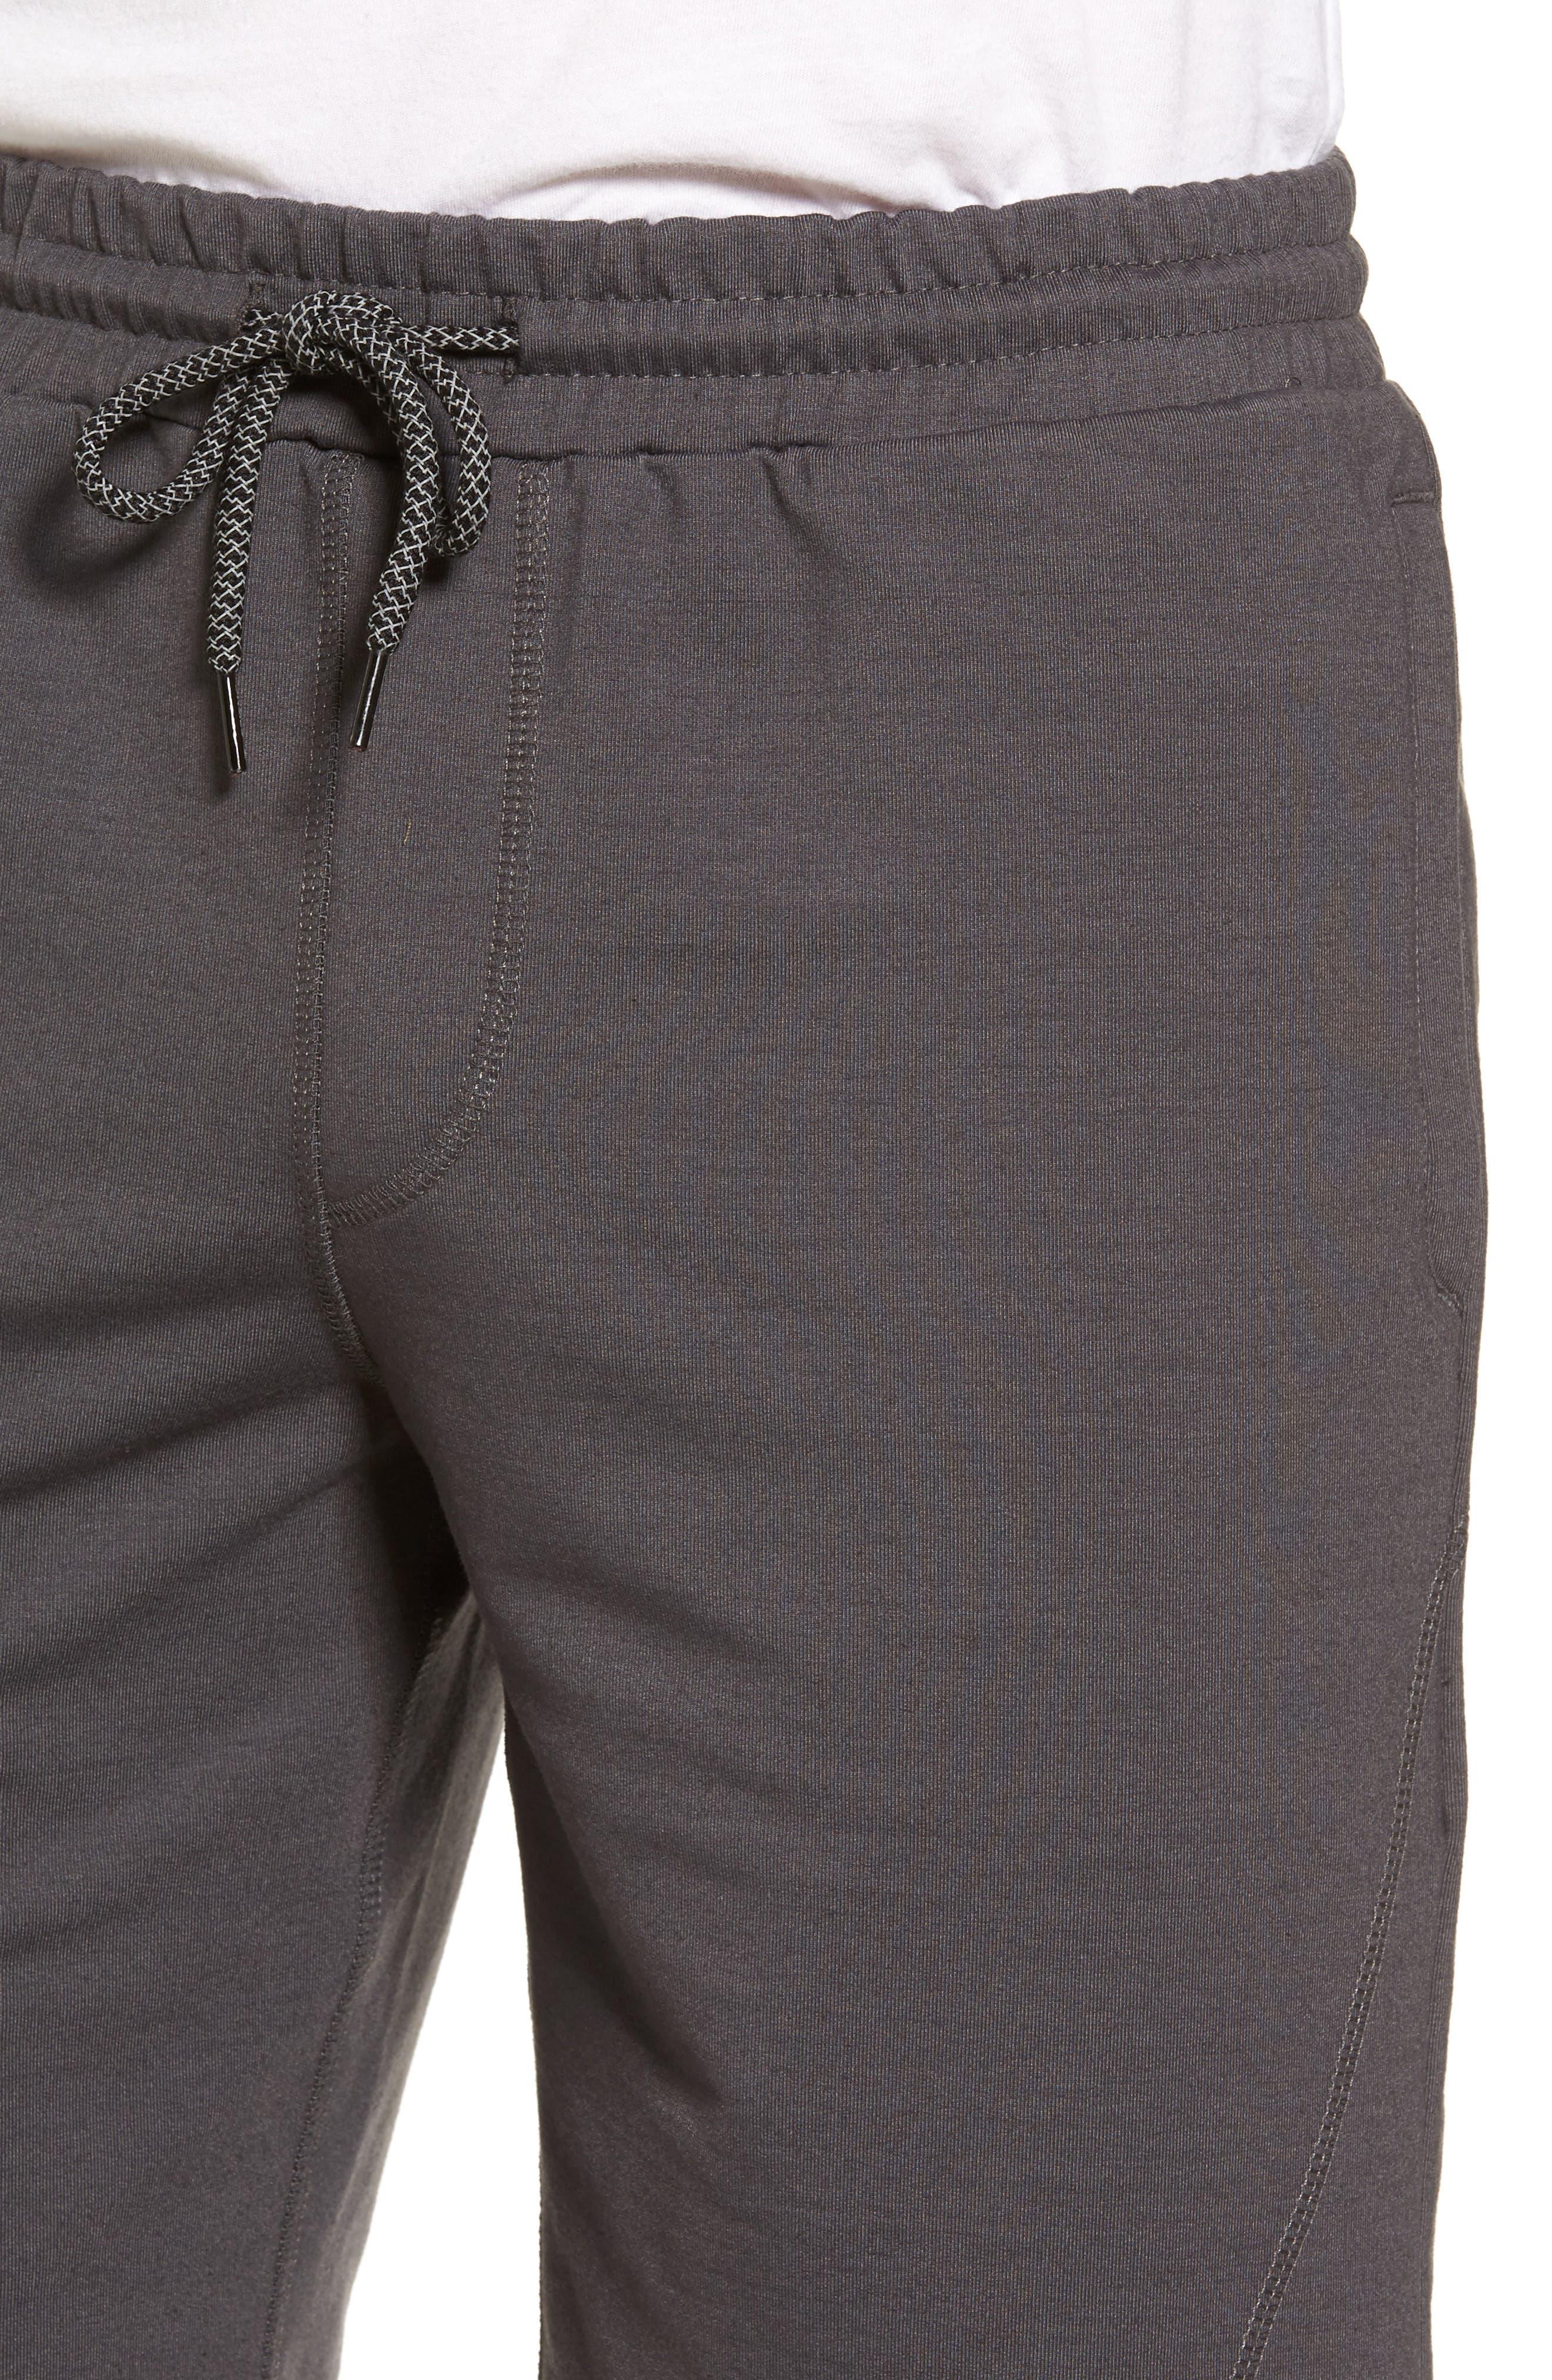 Traveler Fleece Shorts,                             Alternate thumbnail 4, color,                             020